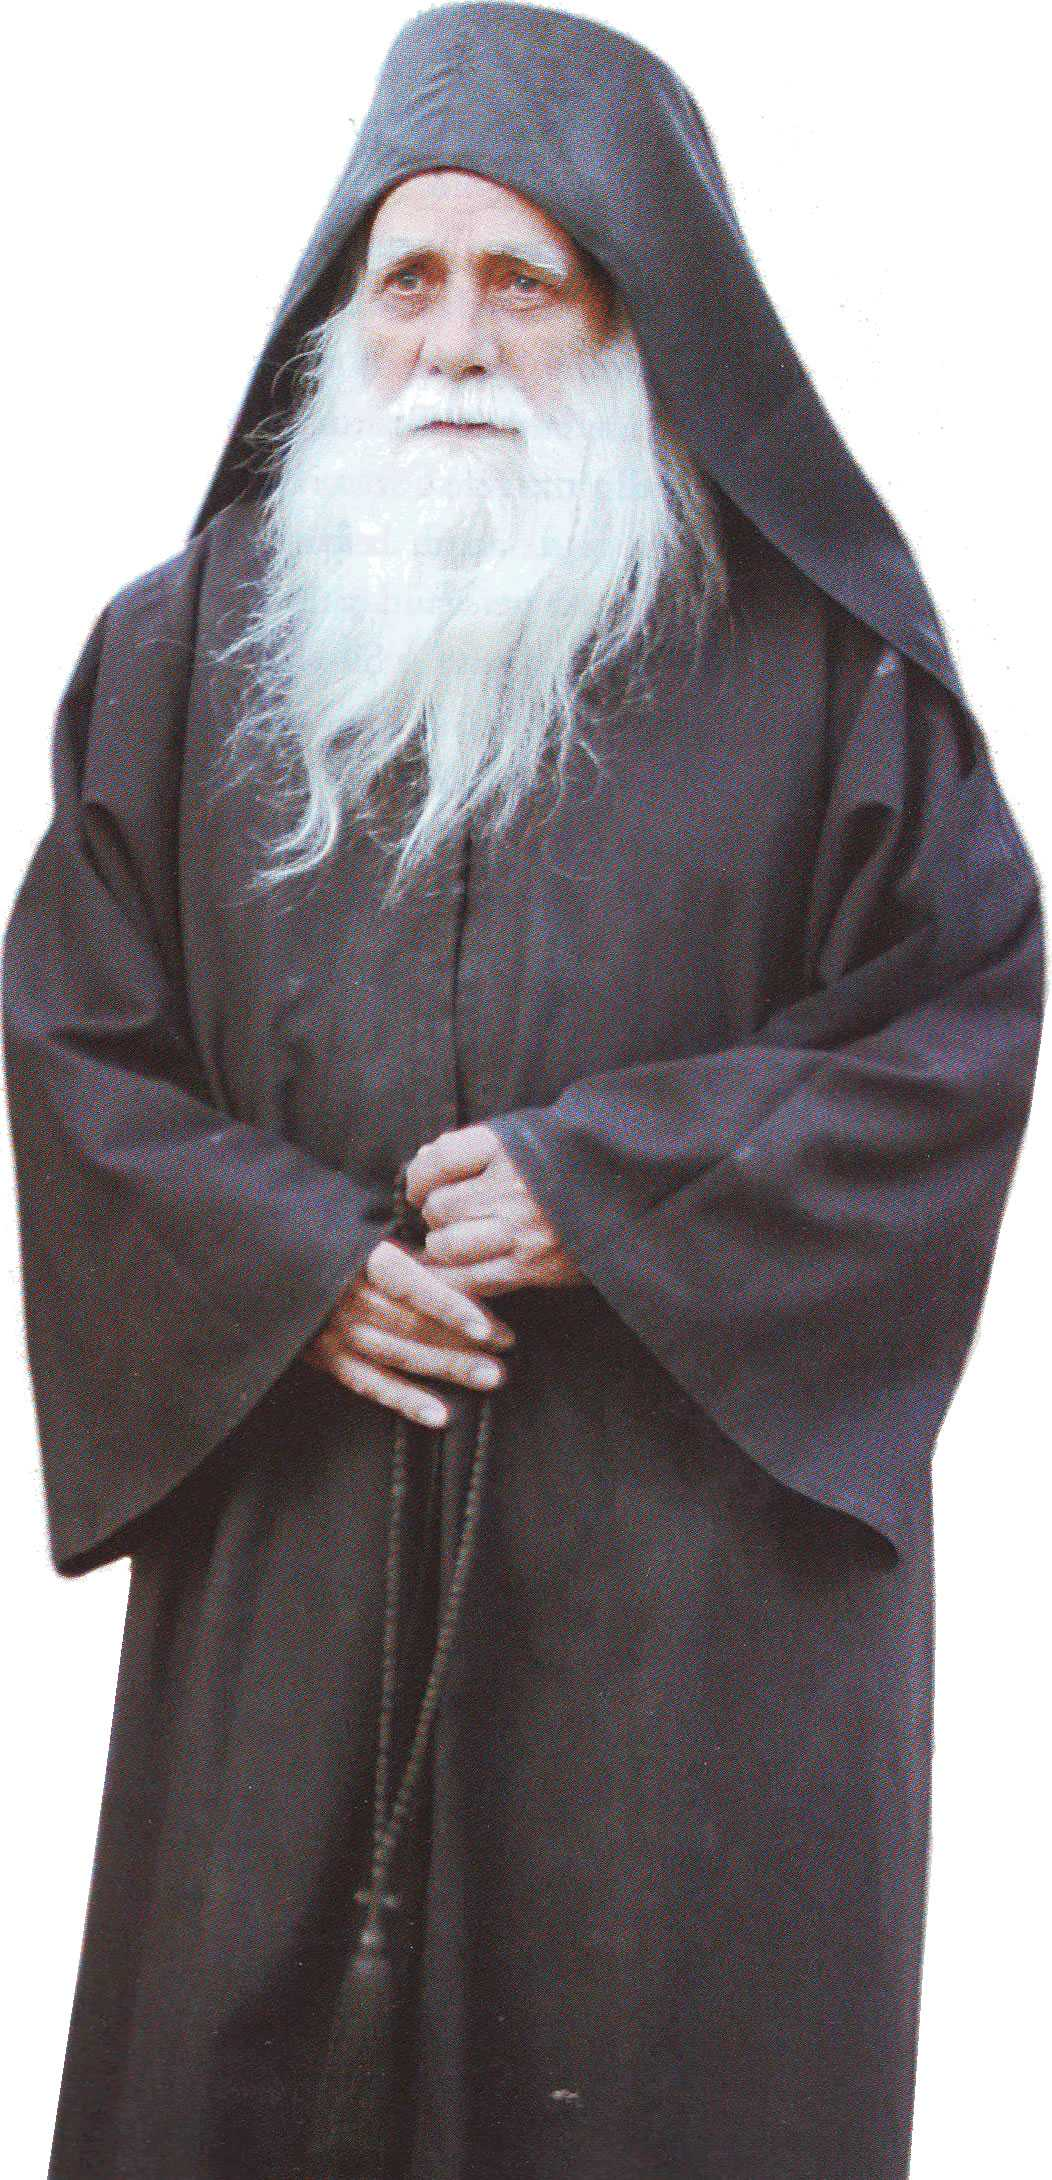 "AVVA IULIAN LAZAR, duhovnicul schitului Prodromu: <i>""Multumescu-ti Tie, Doamne, ca-mi ingadui sa vorbesc cu Tine!""</i>"